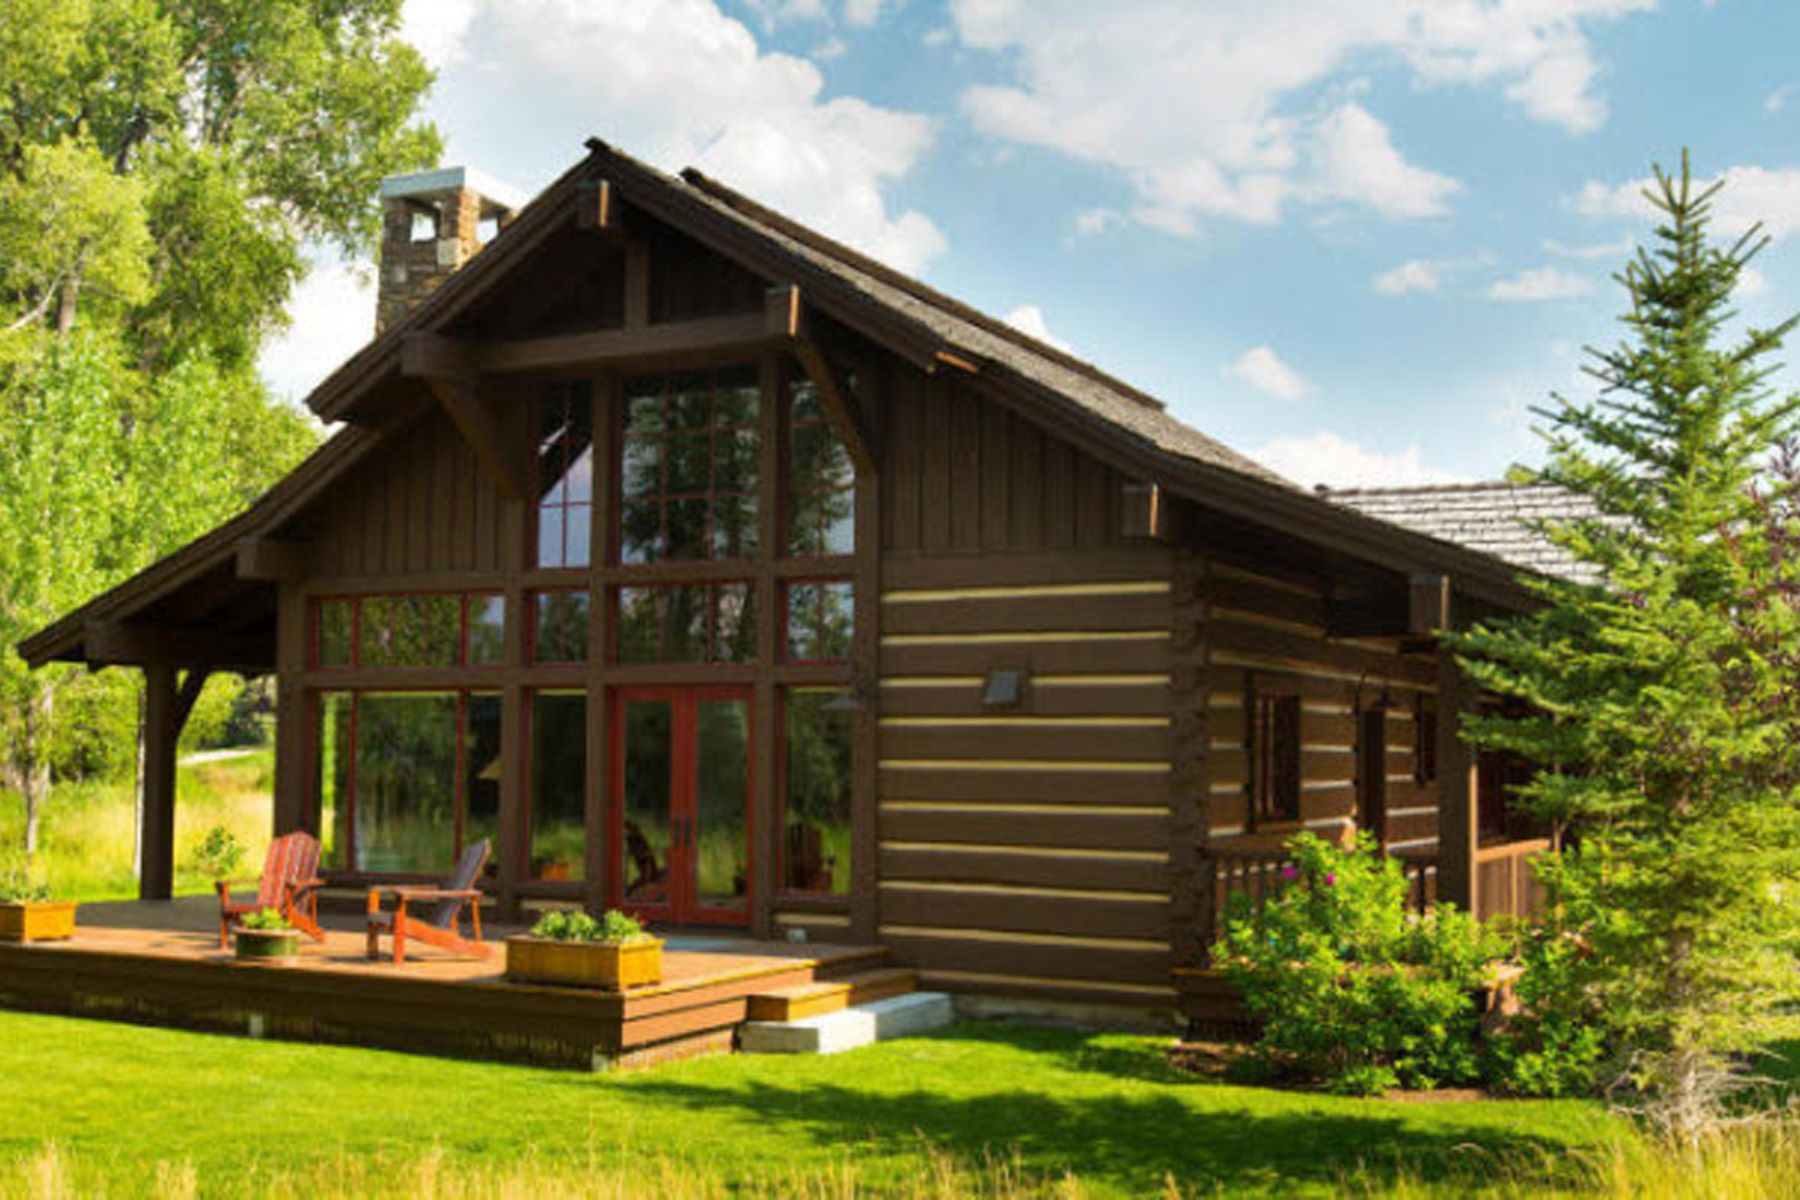 独户住宅 为 销售 在 Rare Find 833 Arnica Ct, 杰克逊, 怀俄明州, 83001 Jackson Hole, 美国